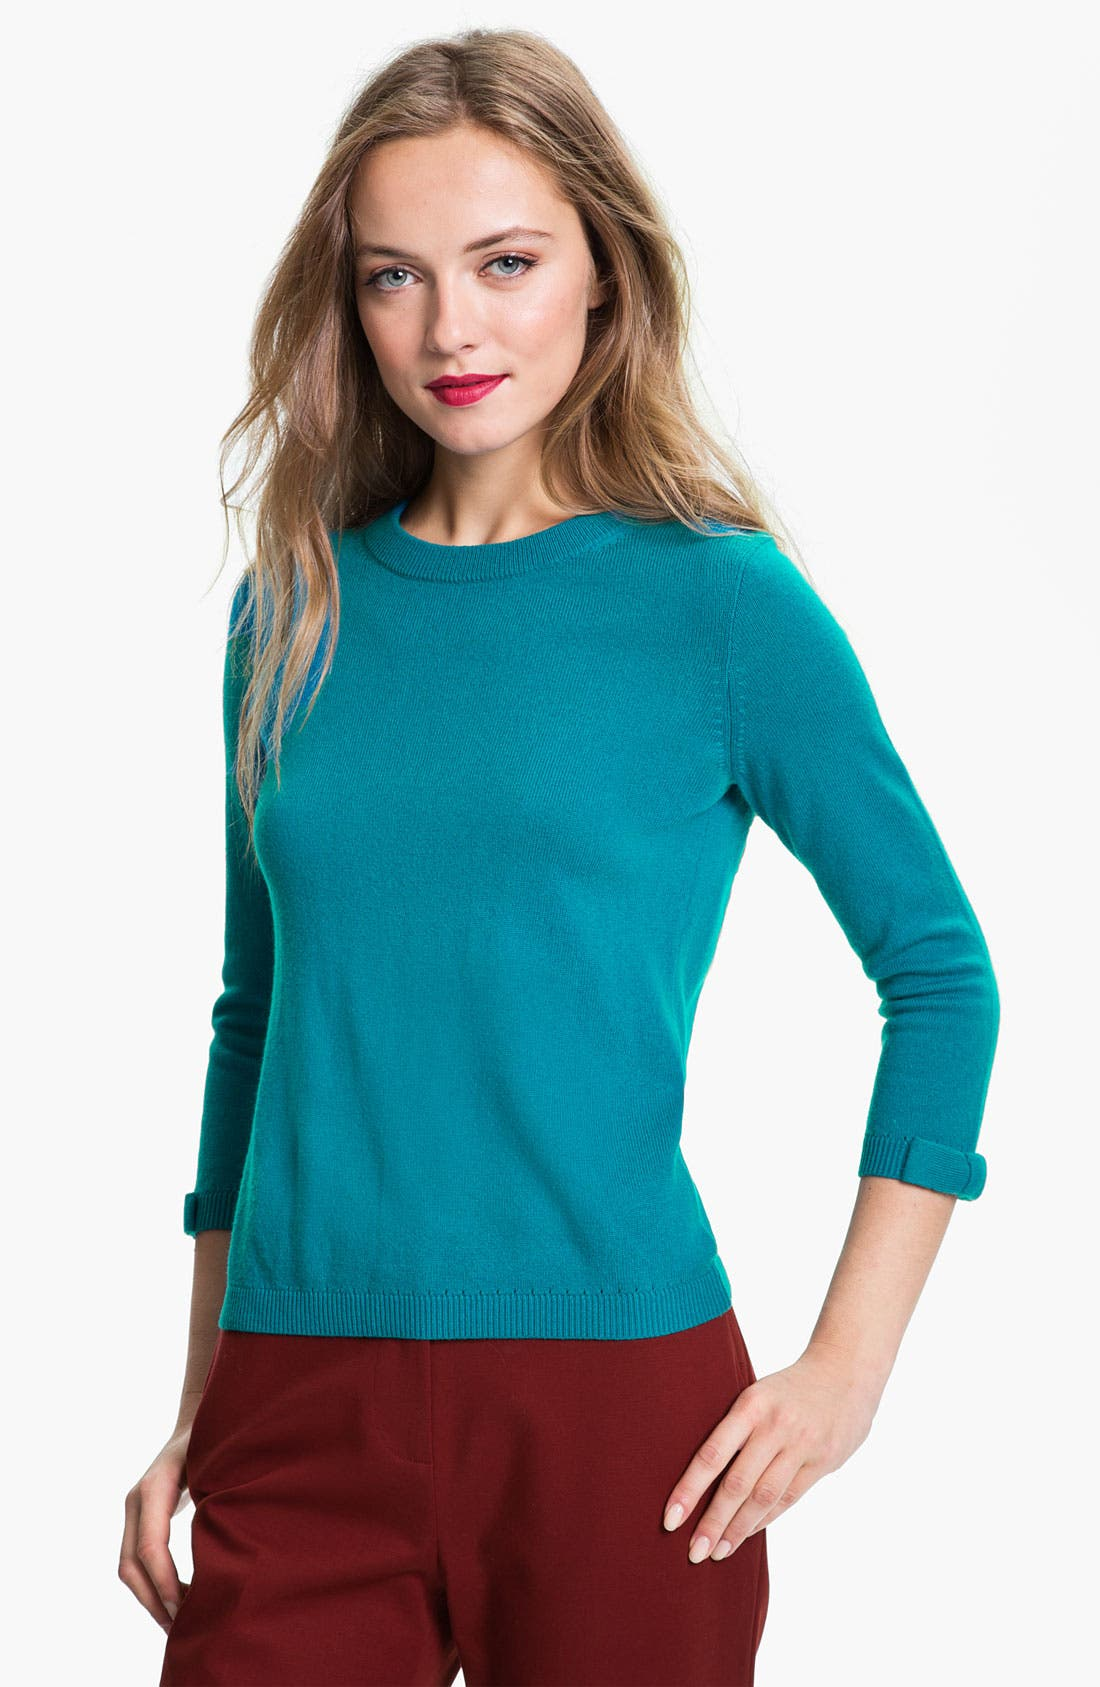 Main Image - kate spade new york 'arianna' sweater